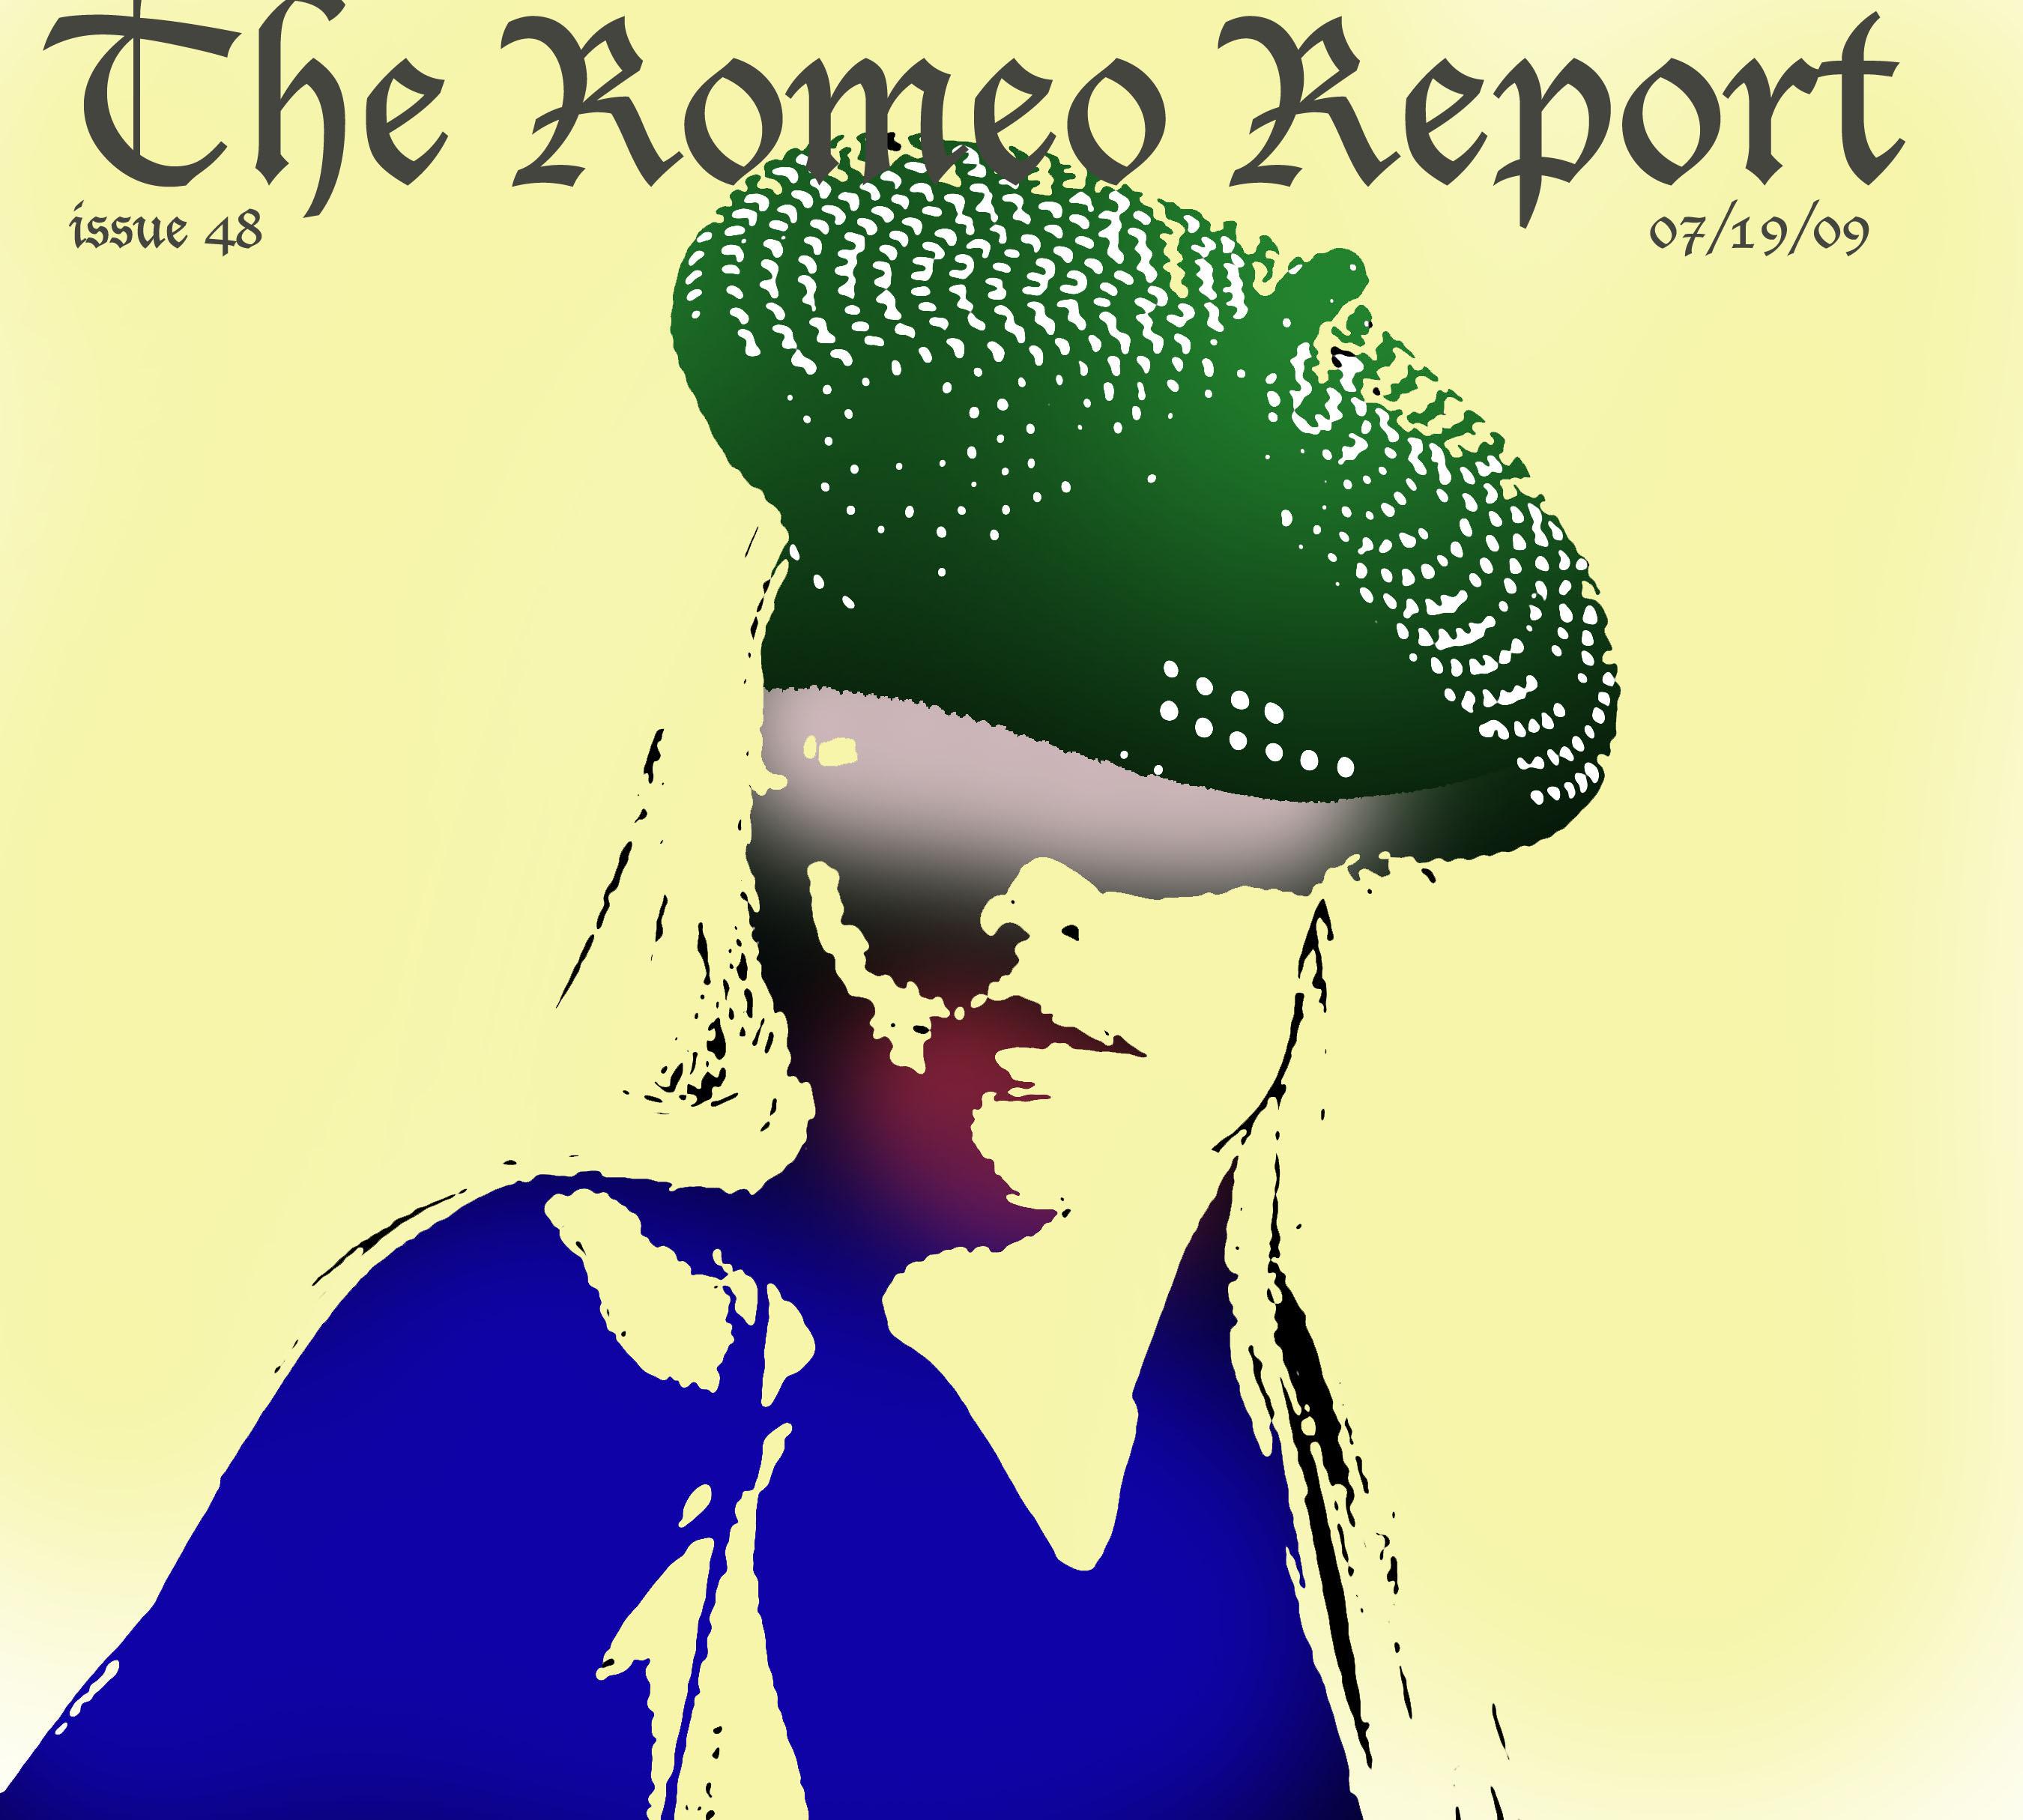 theromeoreport issue 48